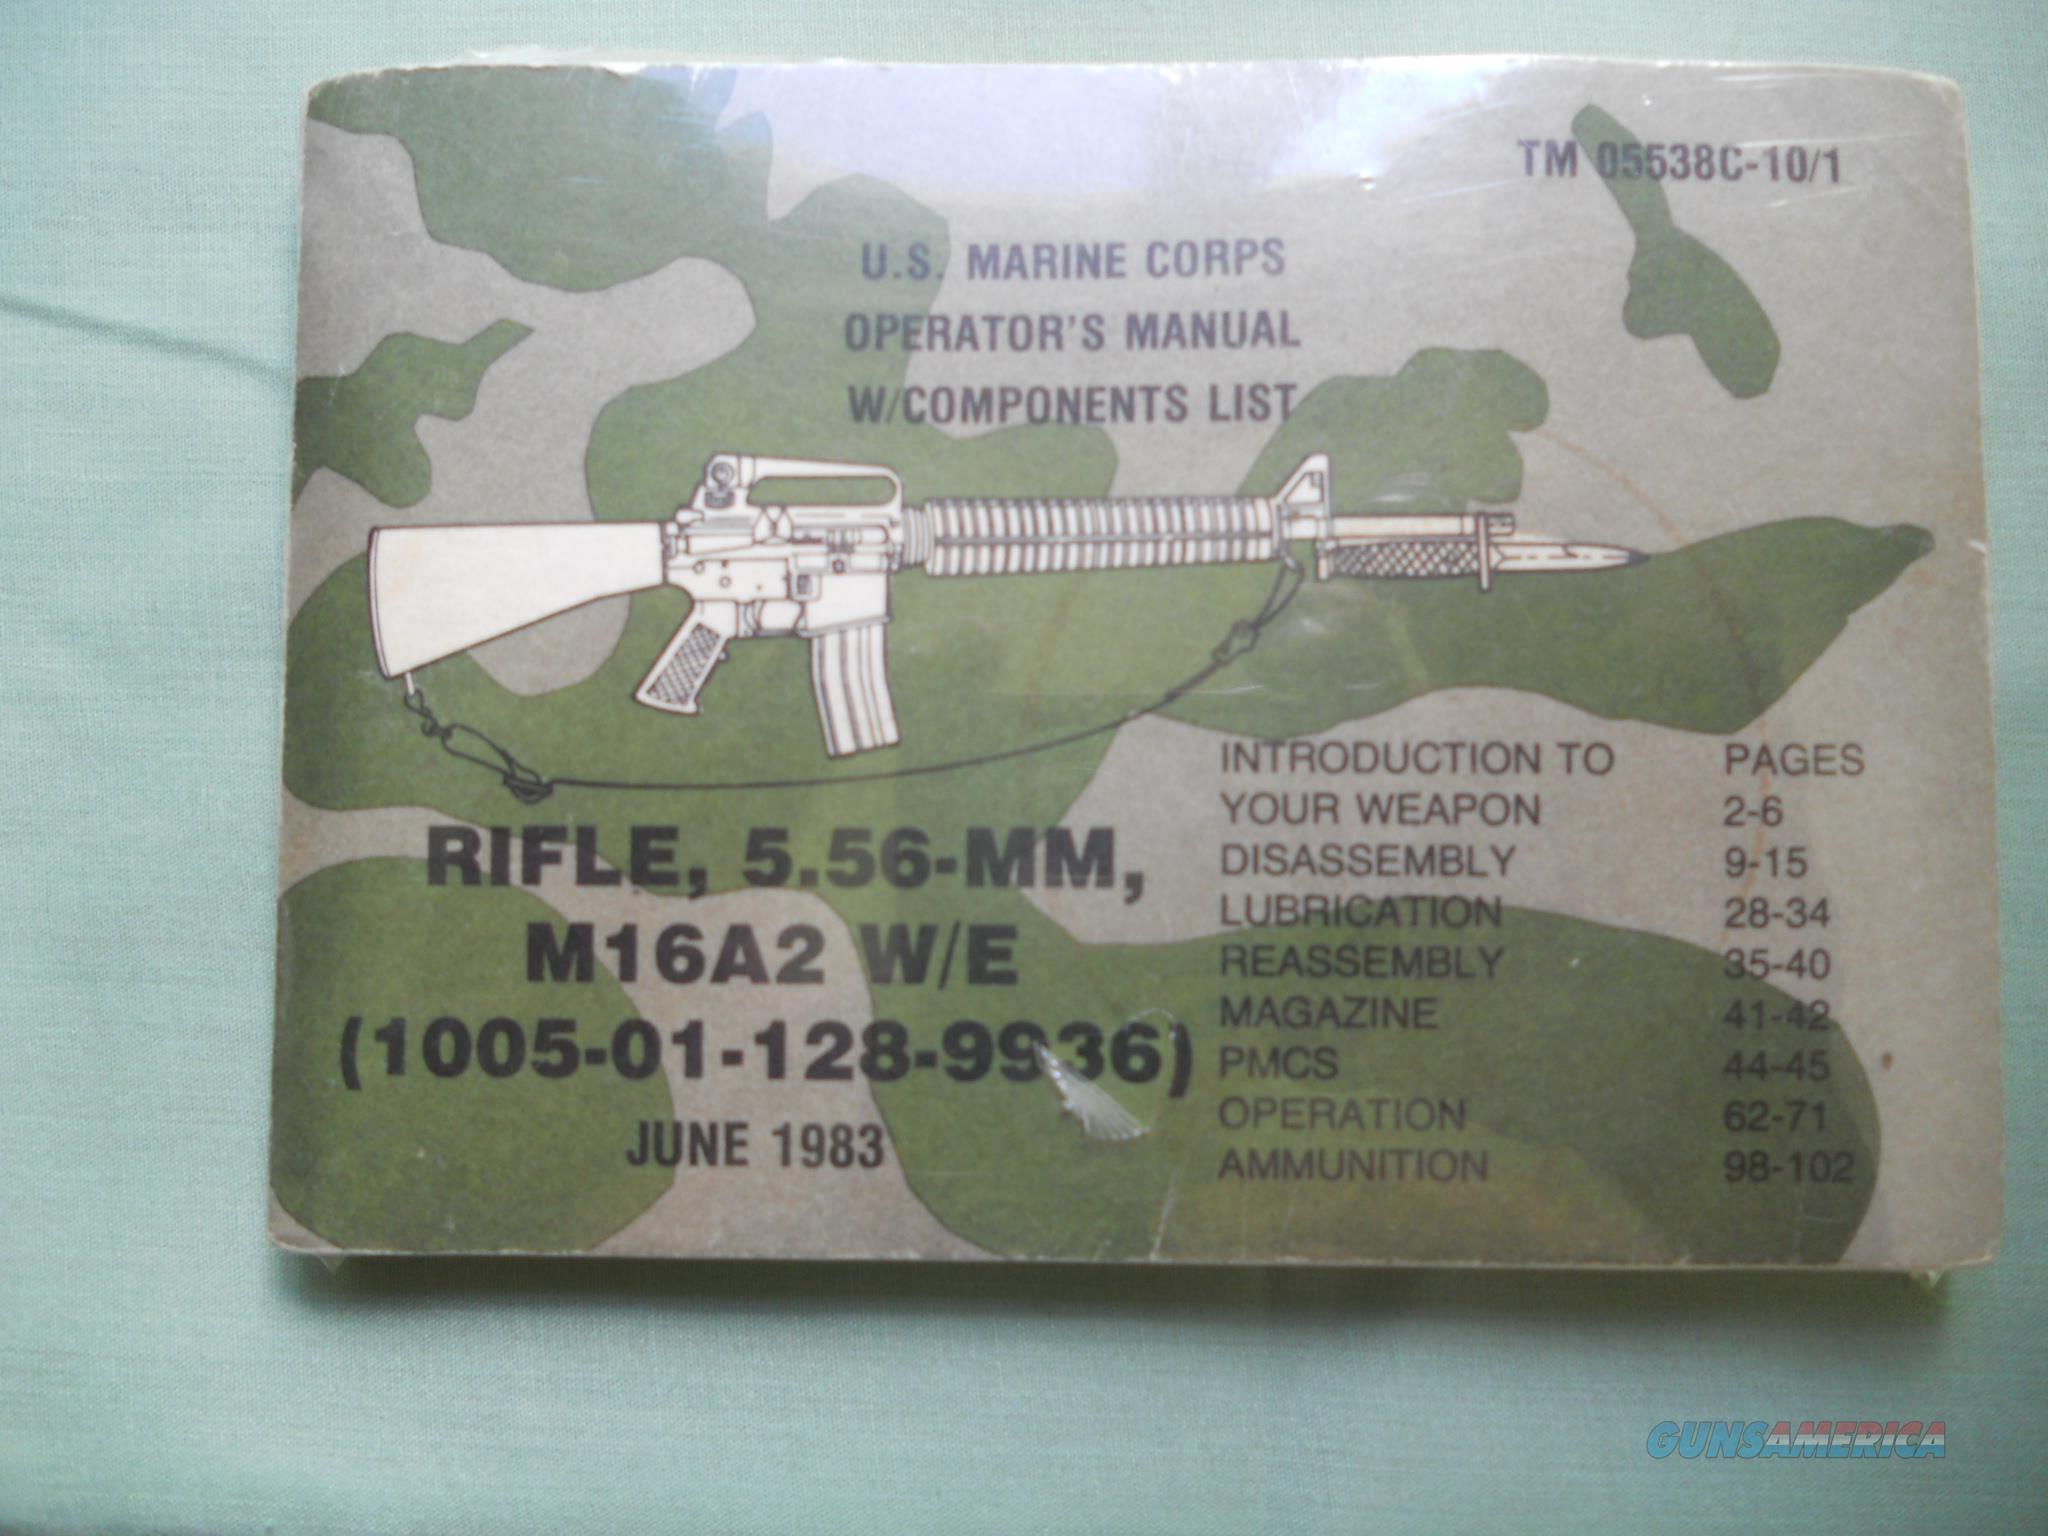 U.S. MARINE CORPS RIFLE , 5.56-MM M16A2 W/E ... Operator's TM 05538C-10/1 ,   Non-Guns > Magazines & Clips > Rifle Magazines > AR-15 Type